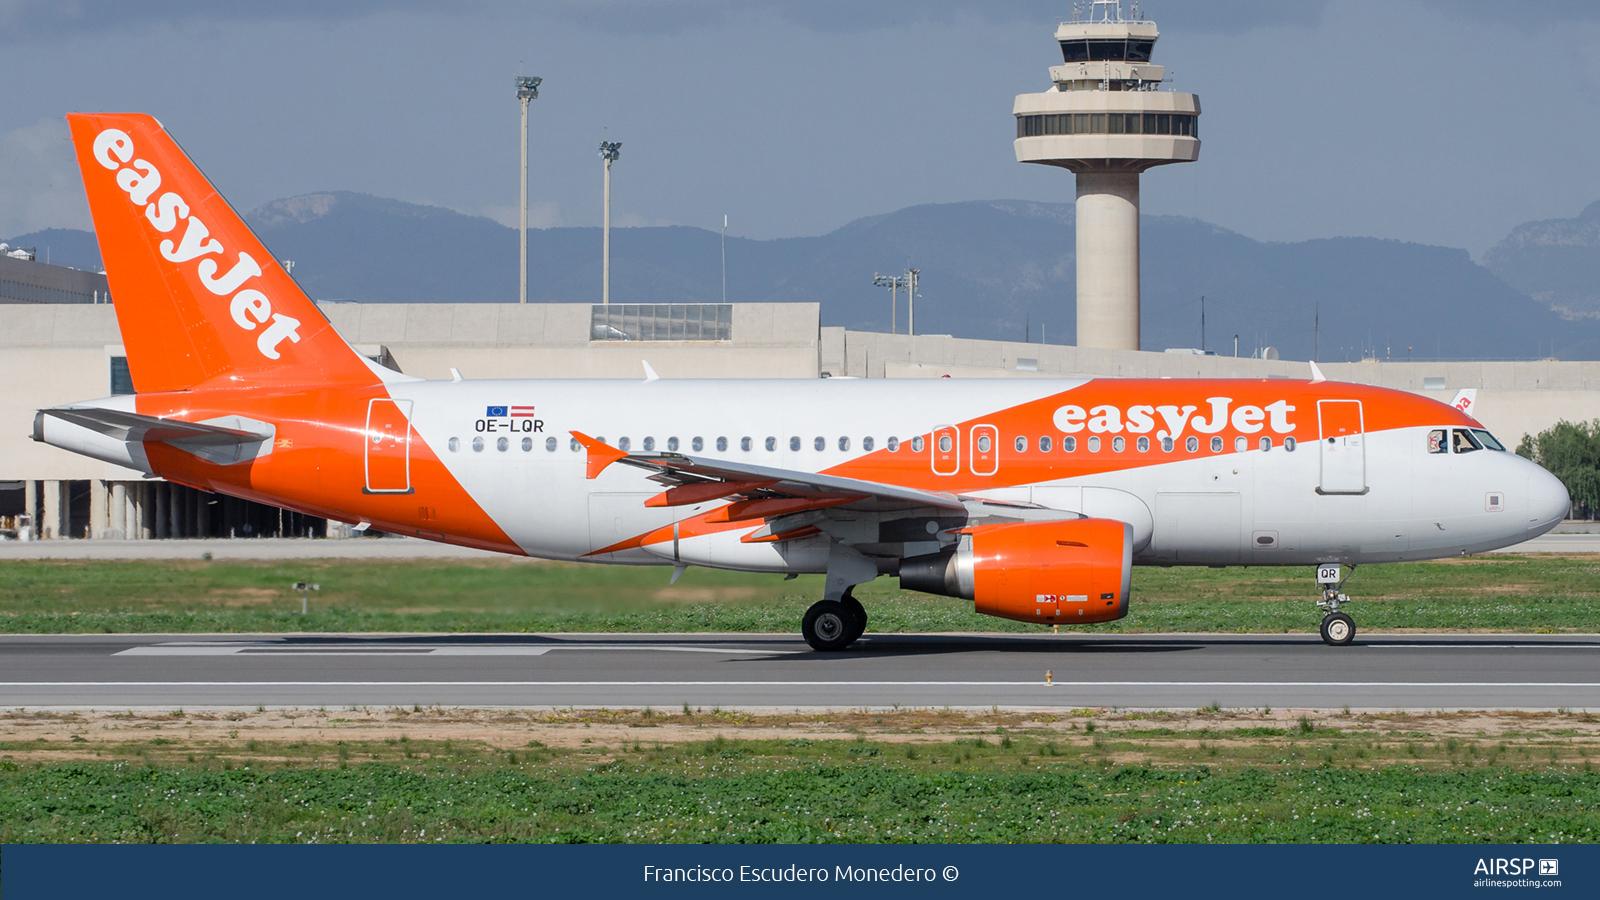 Easyjet  Airbus A319  OE-LQR